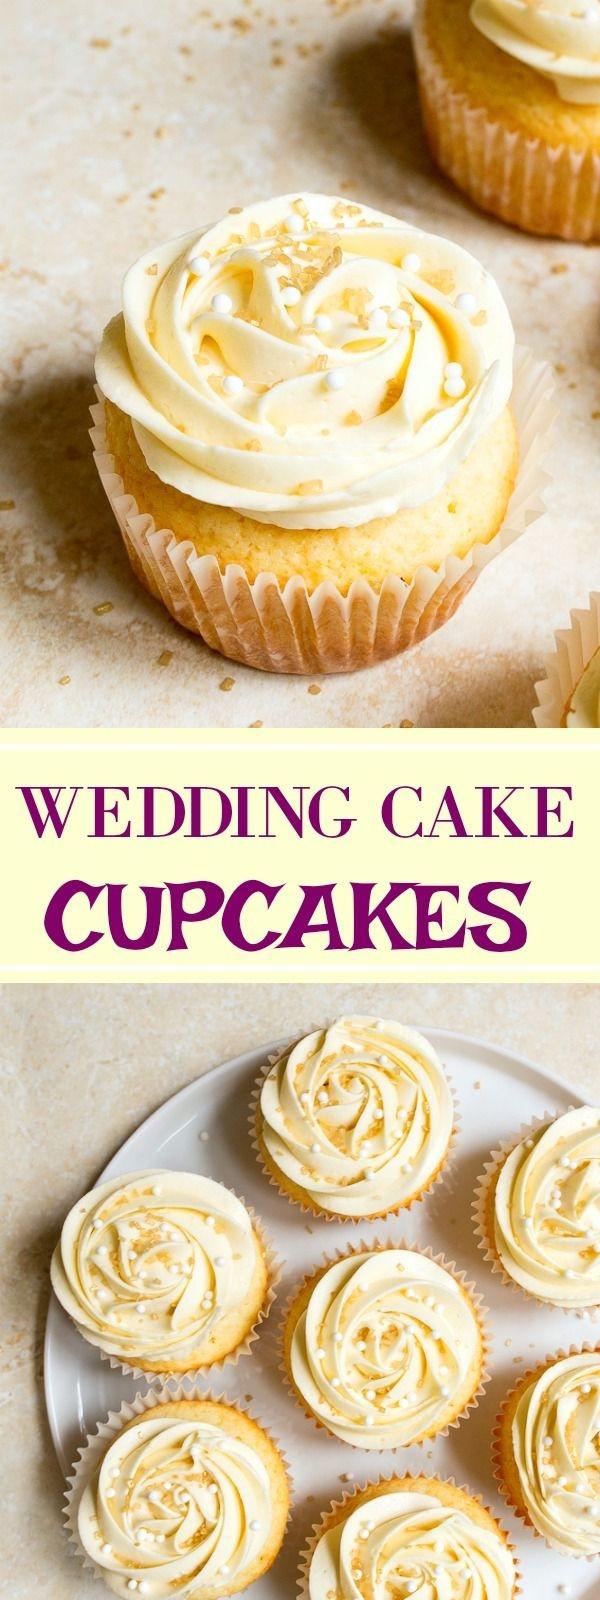 Wedding Cake Cupcakes With Buttercream Frosting  Wedding cupcakes almond wedding cake cupcakes with